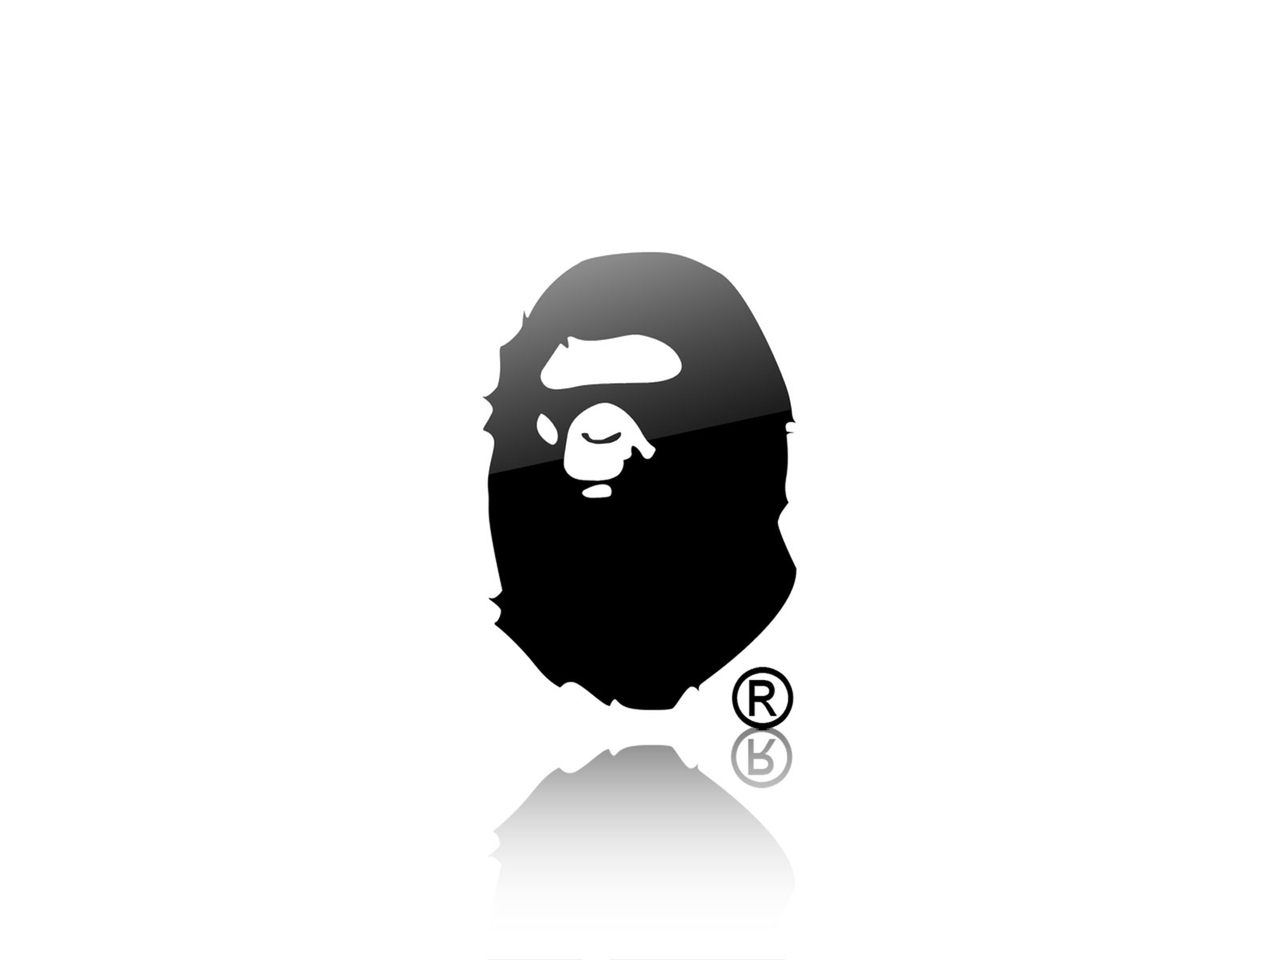 BAPE WALLPAPERS 1280x960